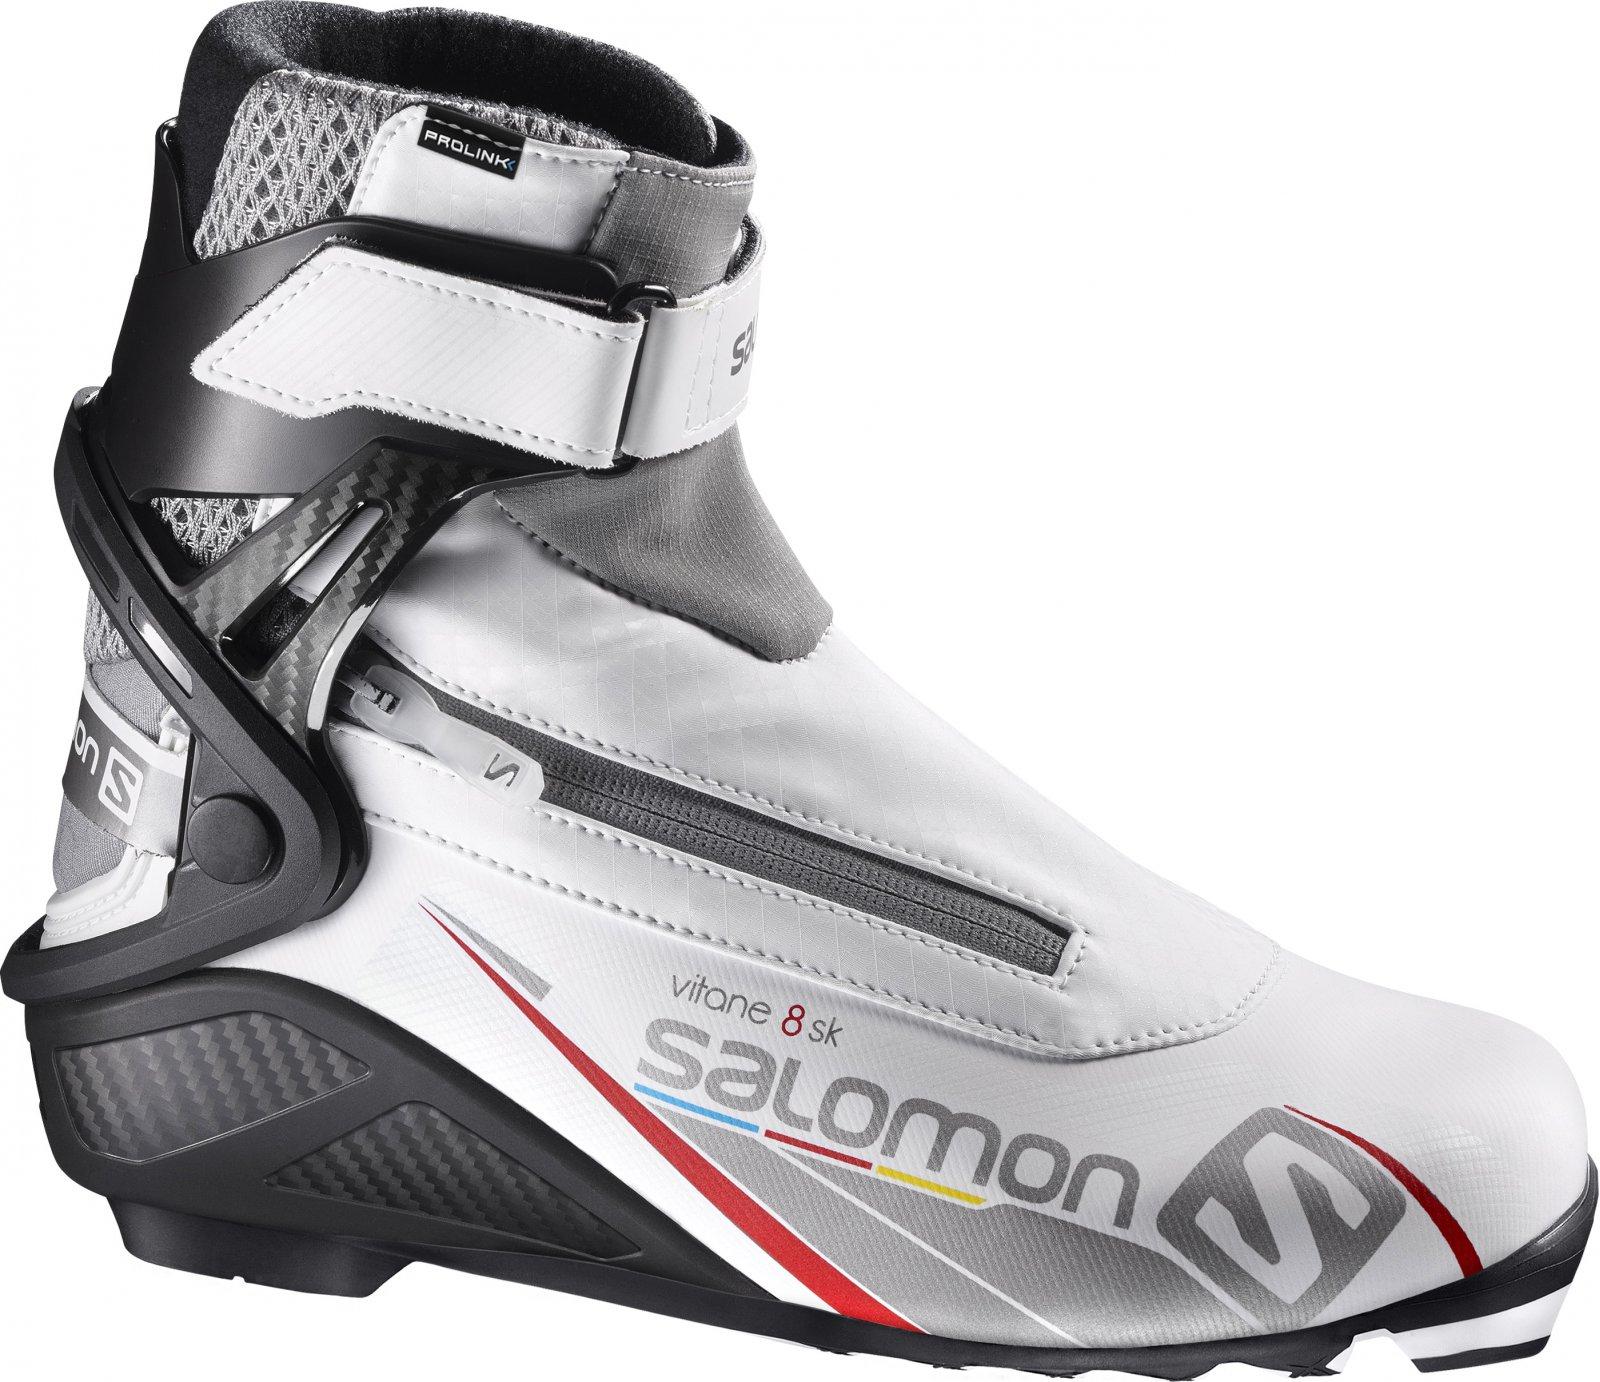 Salomon Vitane 8 Skate Prolink White 40 od 3 990 Kč • Zboží.cz 3428832498